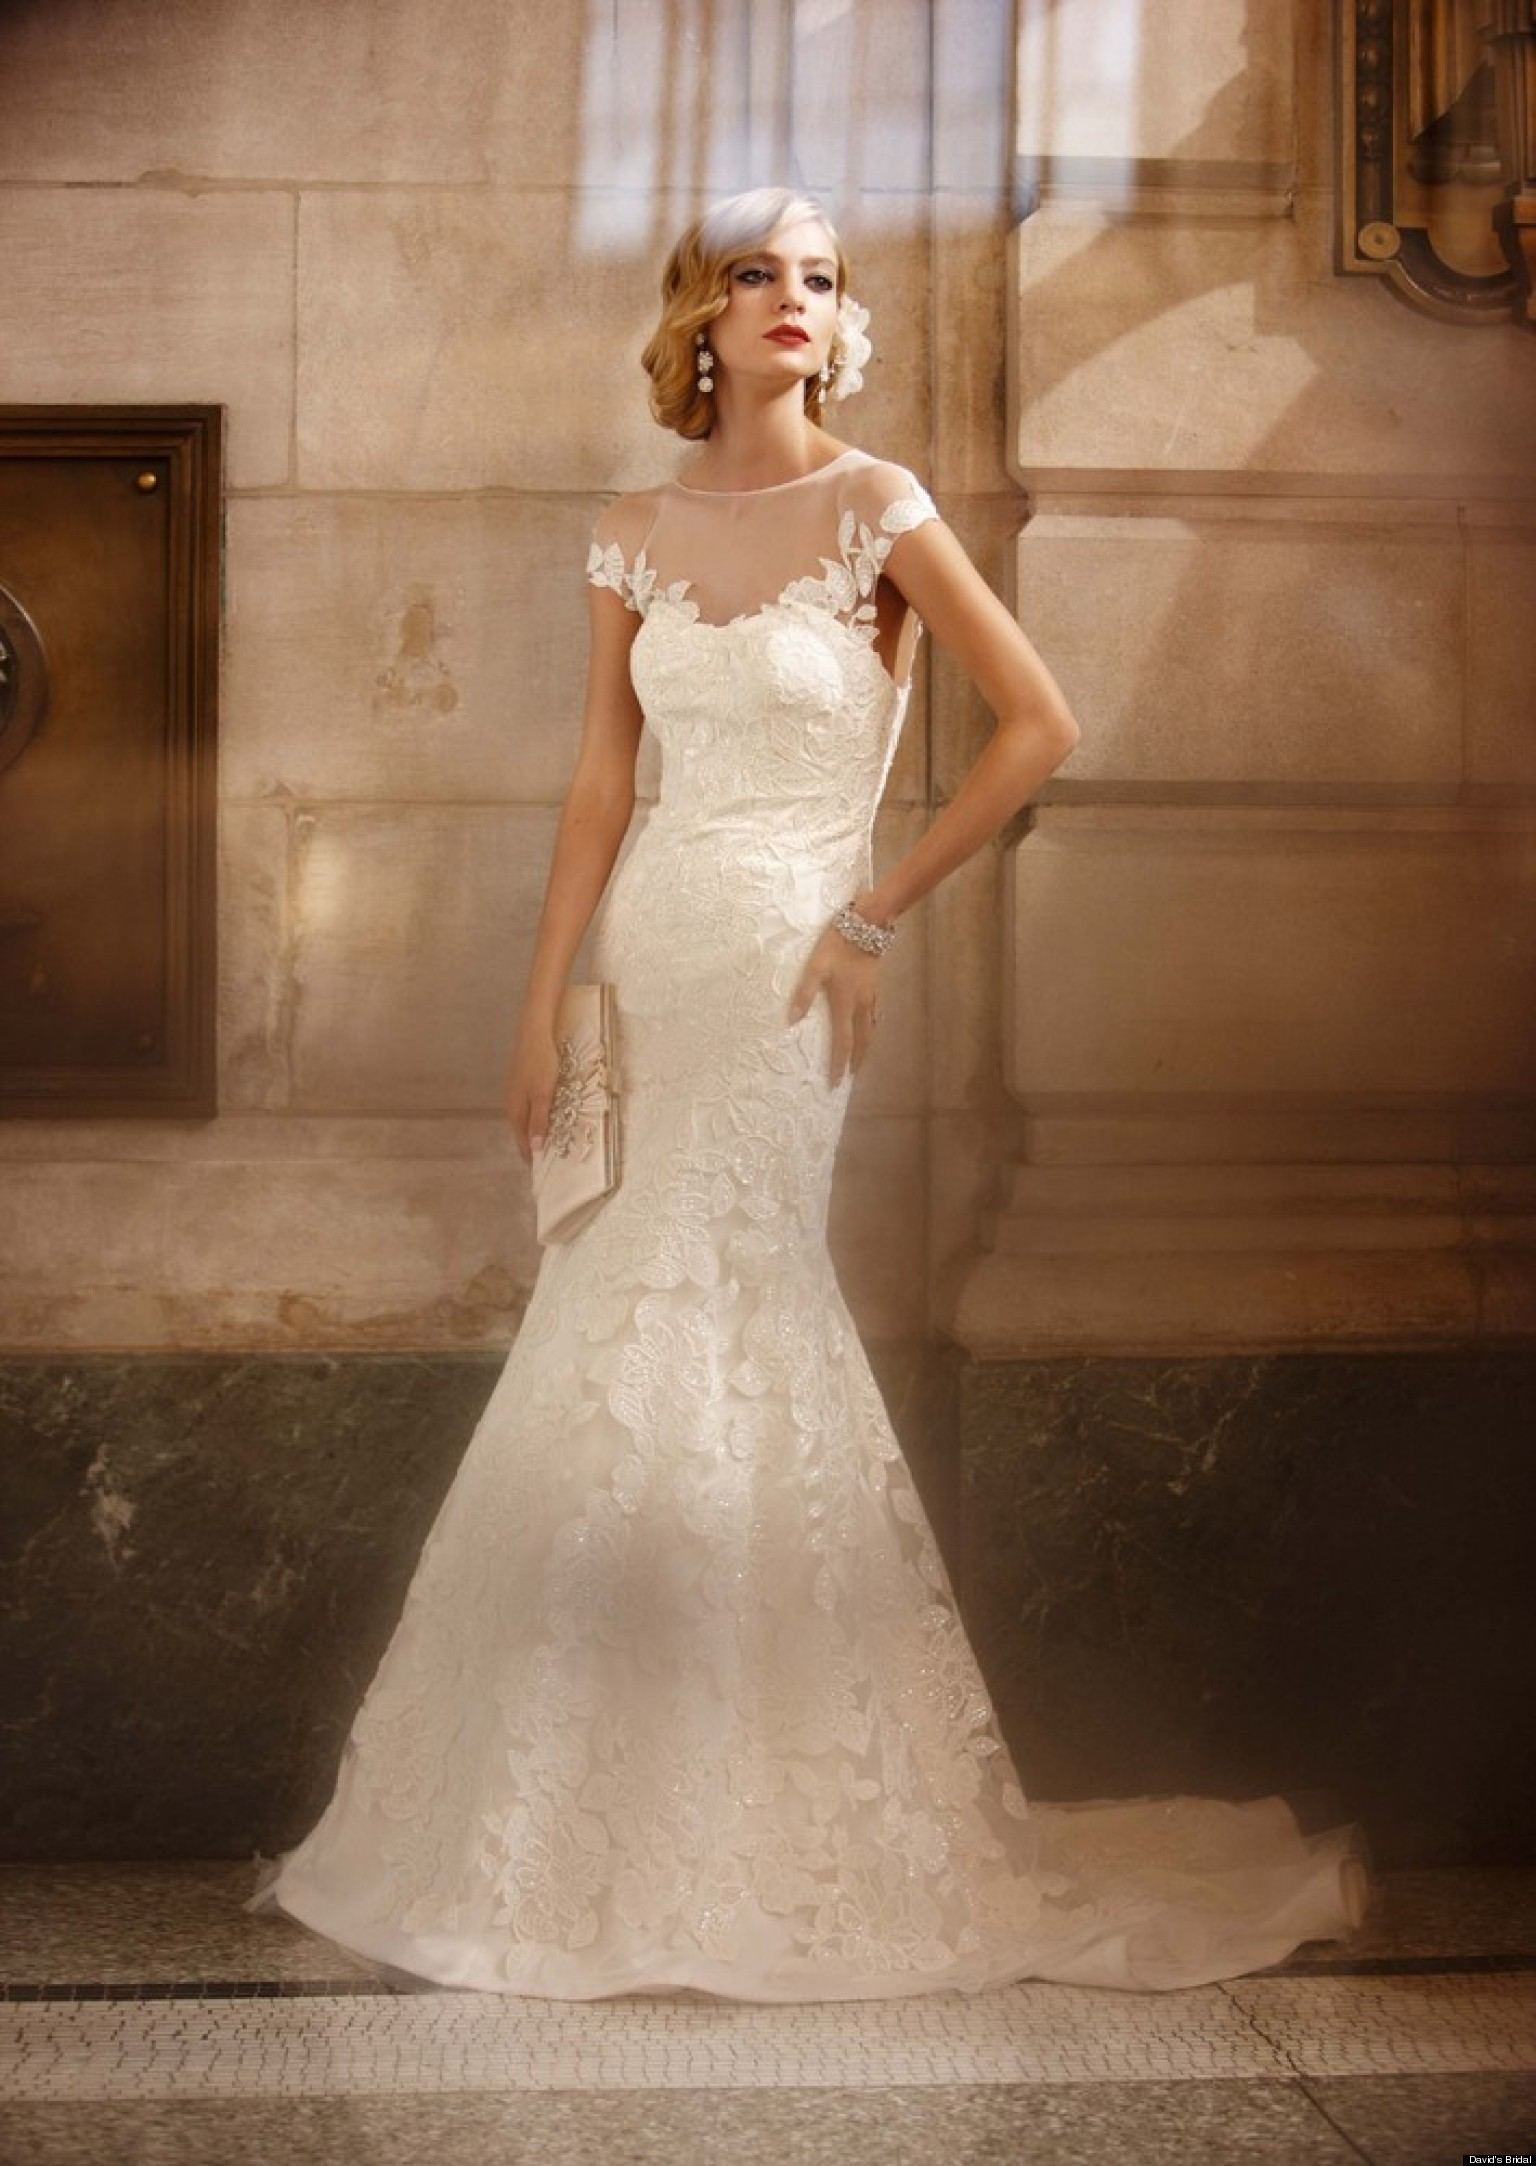 davids bridal wedding dresses n davids bridal wedding dresses David s Bridal Wedding Dresses HuffPost Weddings Editors Picks PHOTOS HuffPost